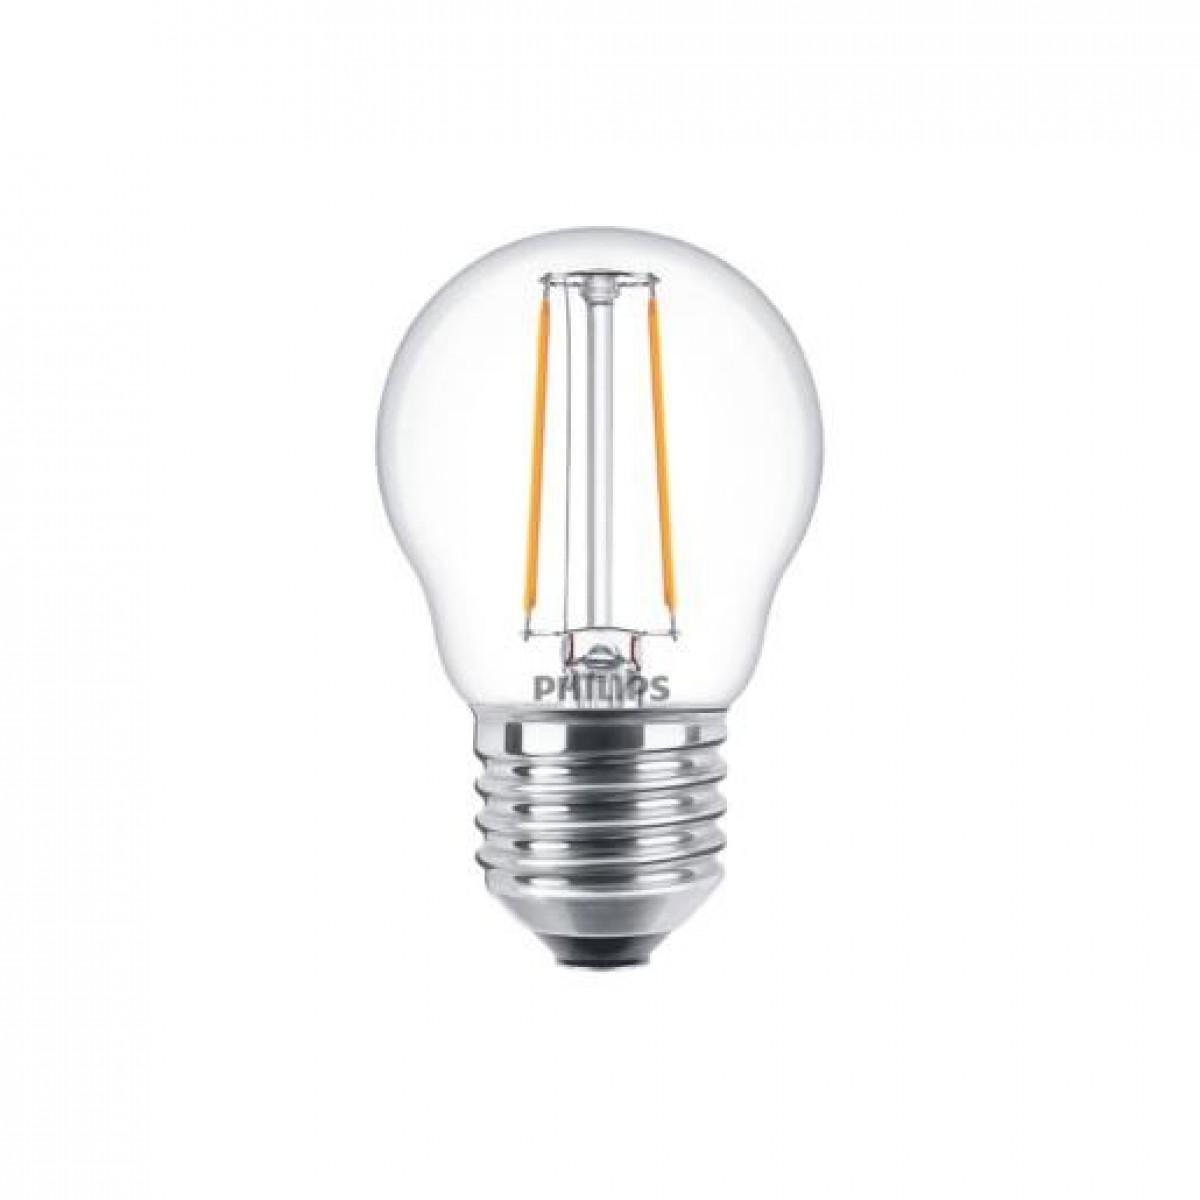 led lamp e27 2 watt excellent philips e led bulb with led lamp e27 2 watt simple led lamp e27. Black Bedroom Furniture Sets. Home Design Ideas